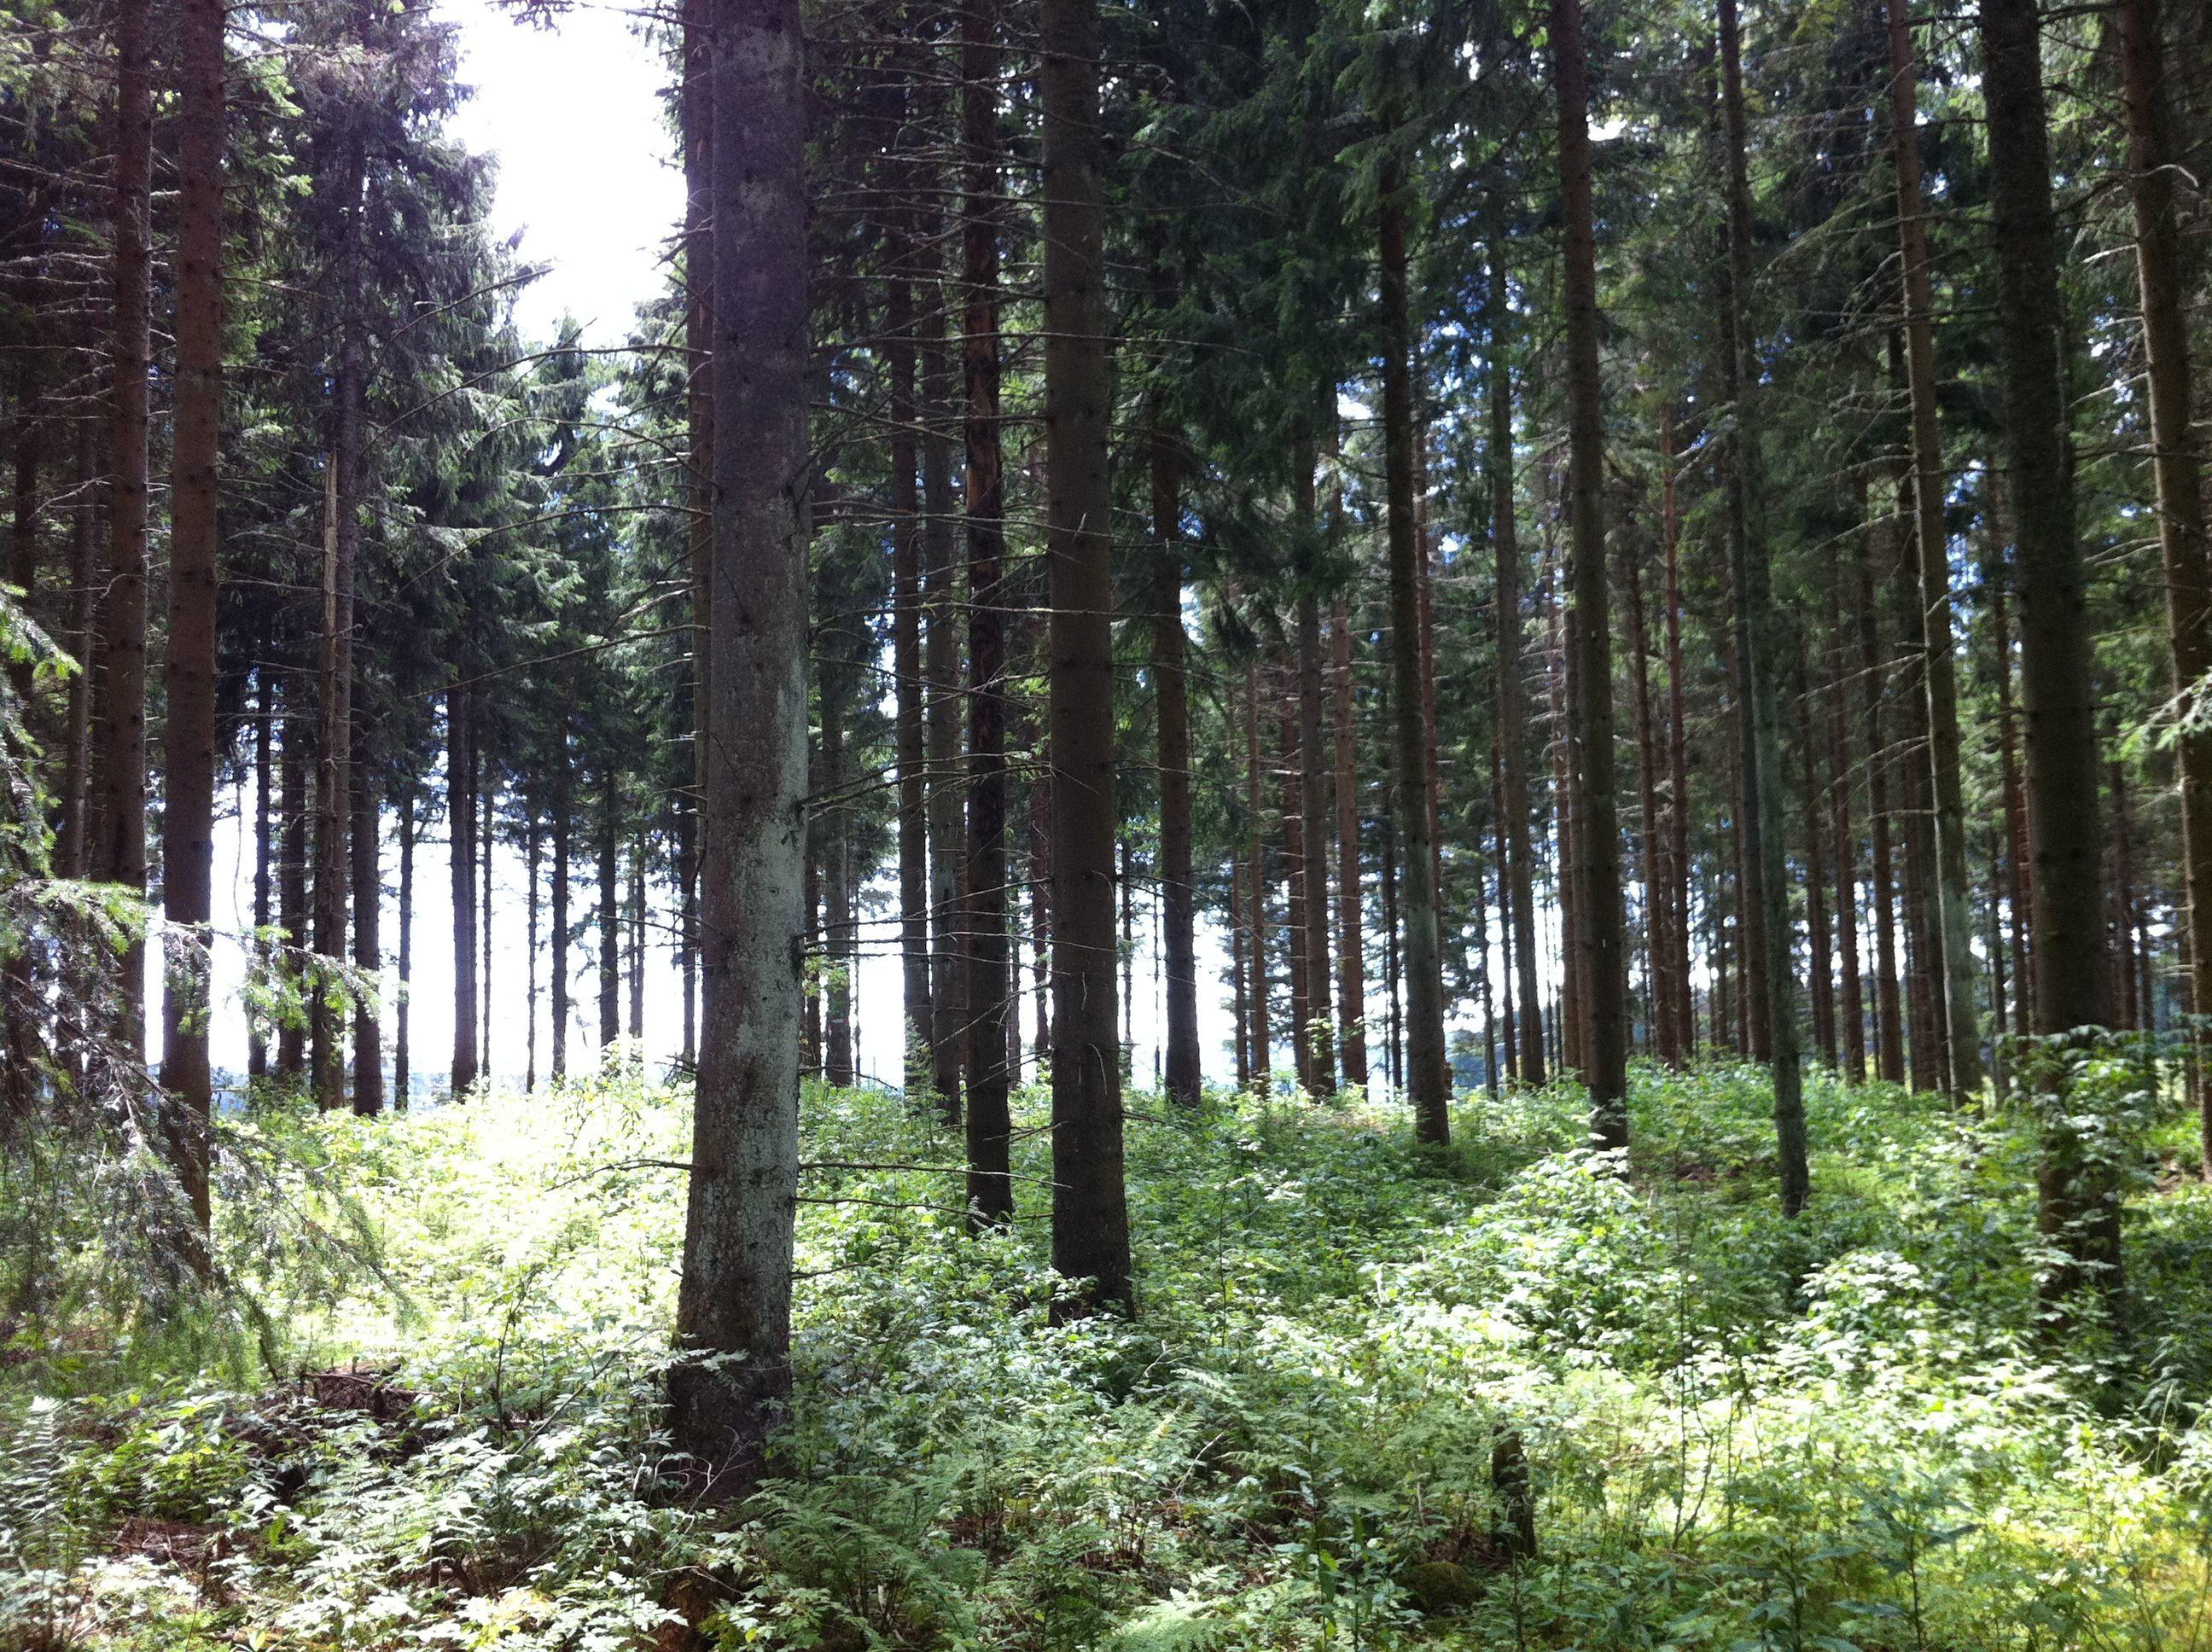 Sonnenwald_dkthxb